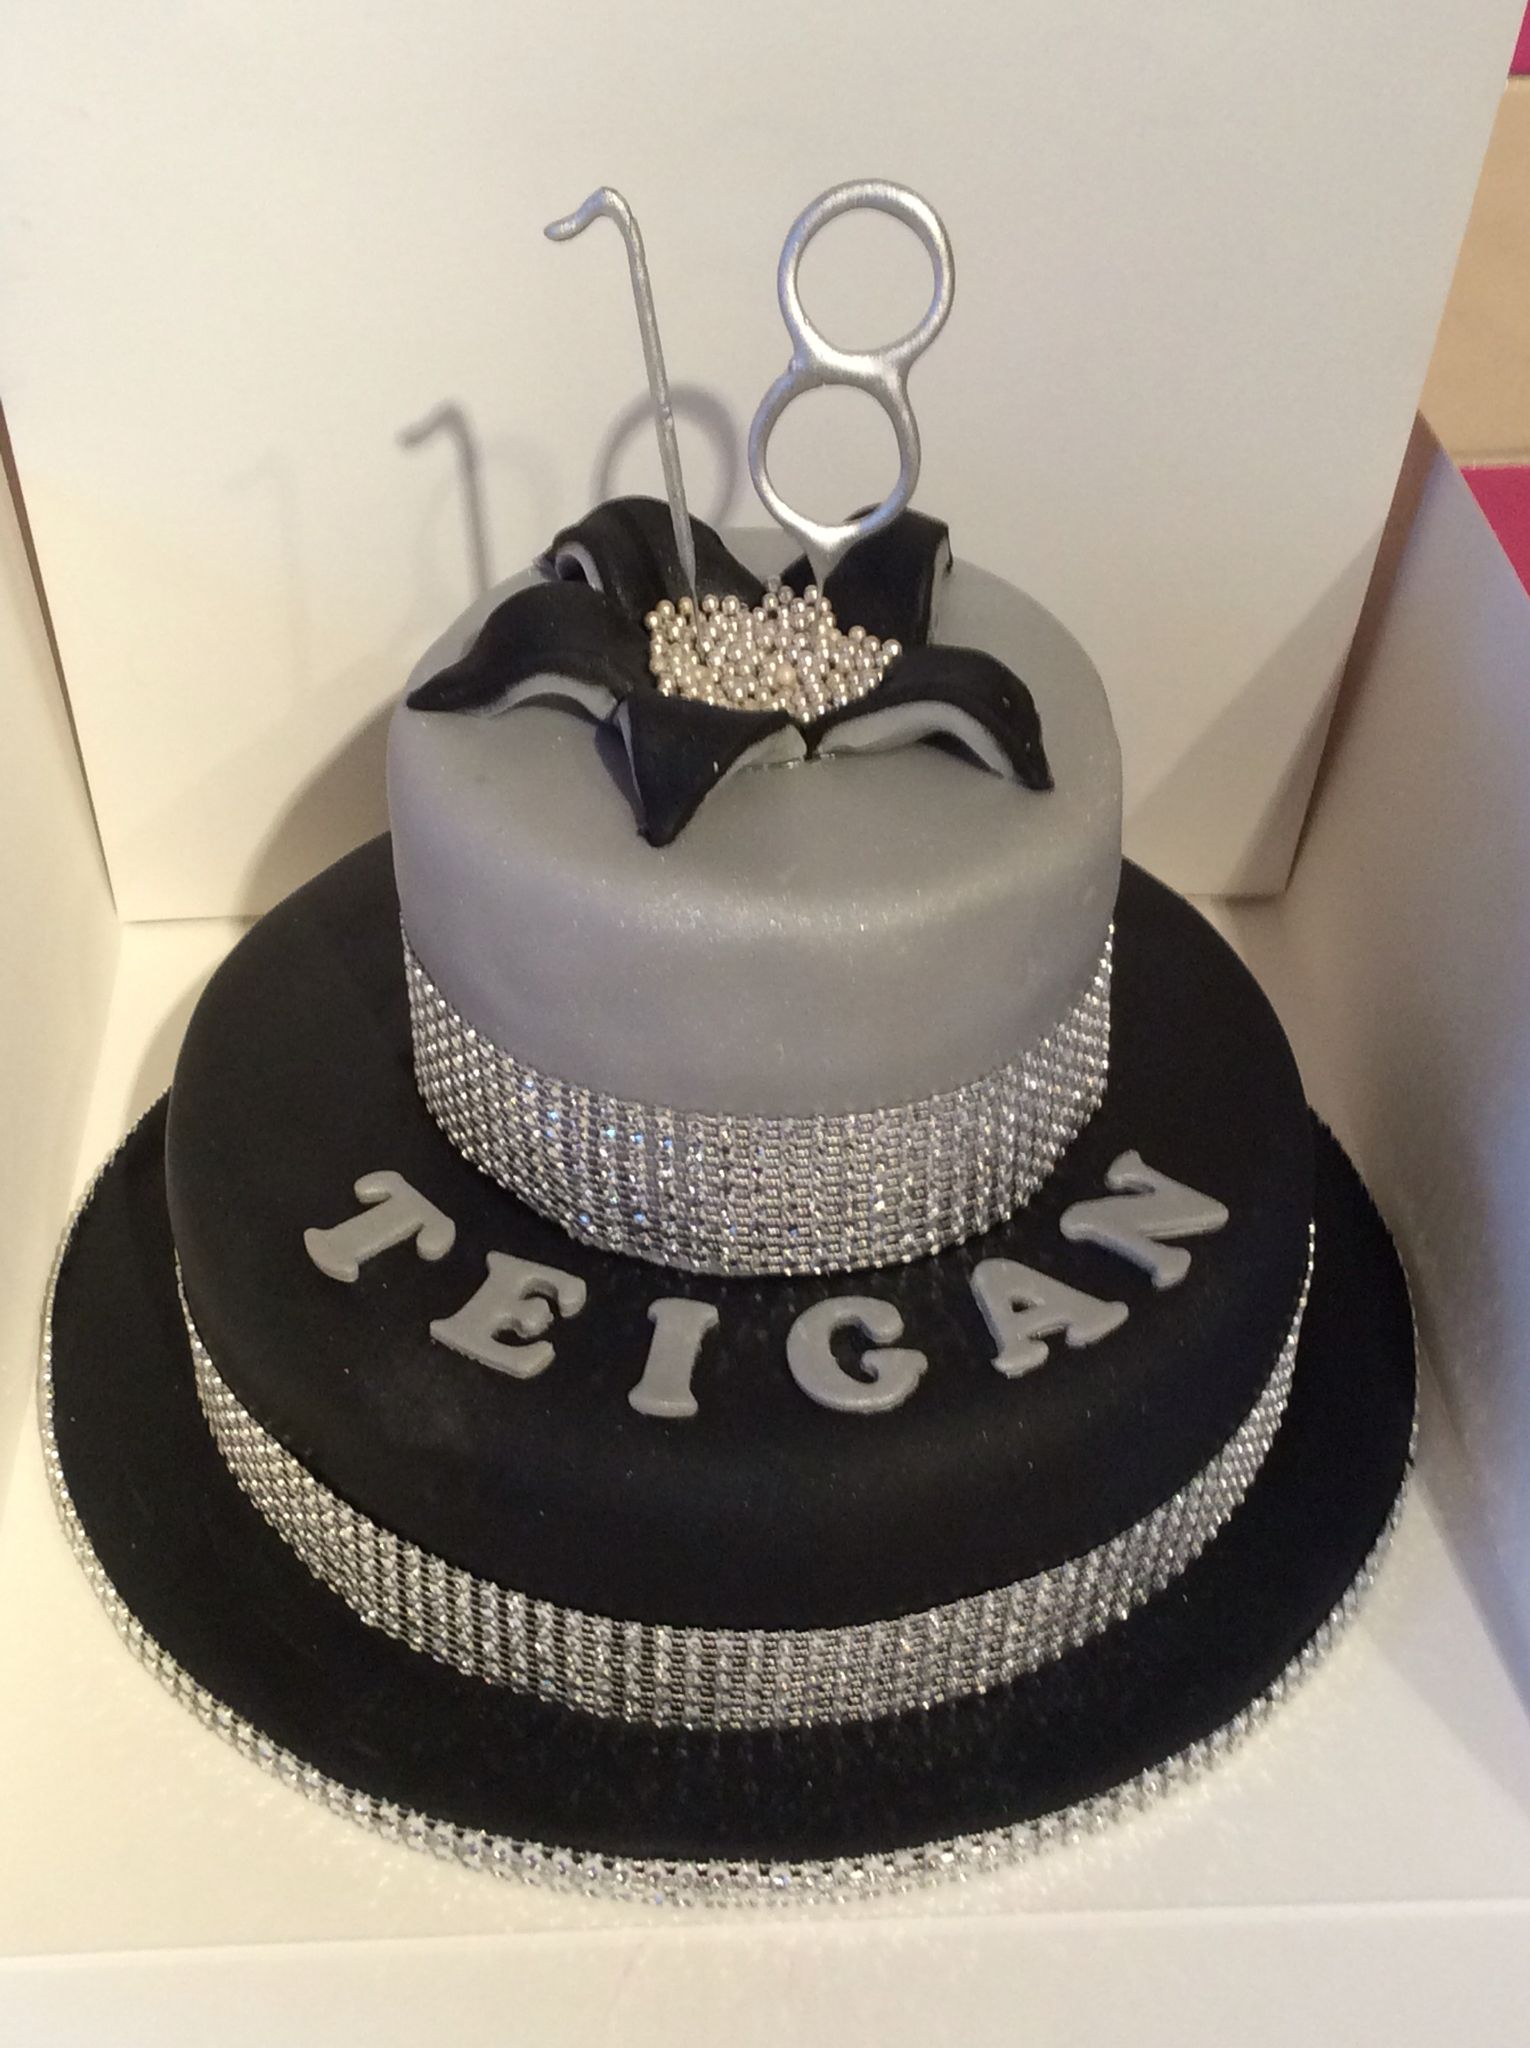 18th Birthday Black Silver And Bling Starburst Cake My